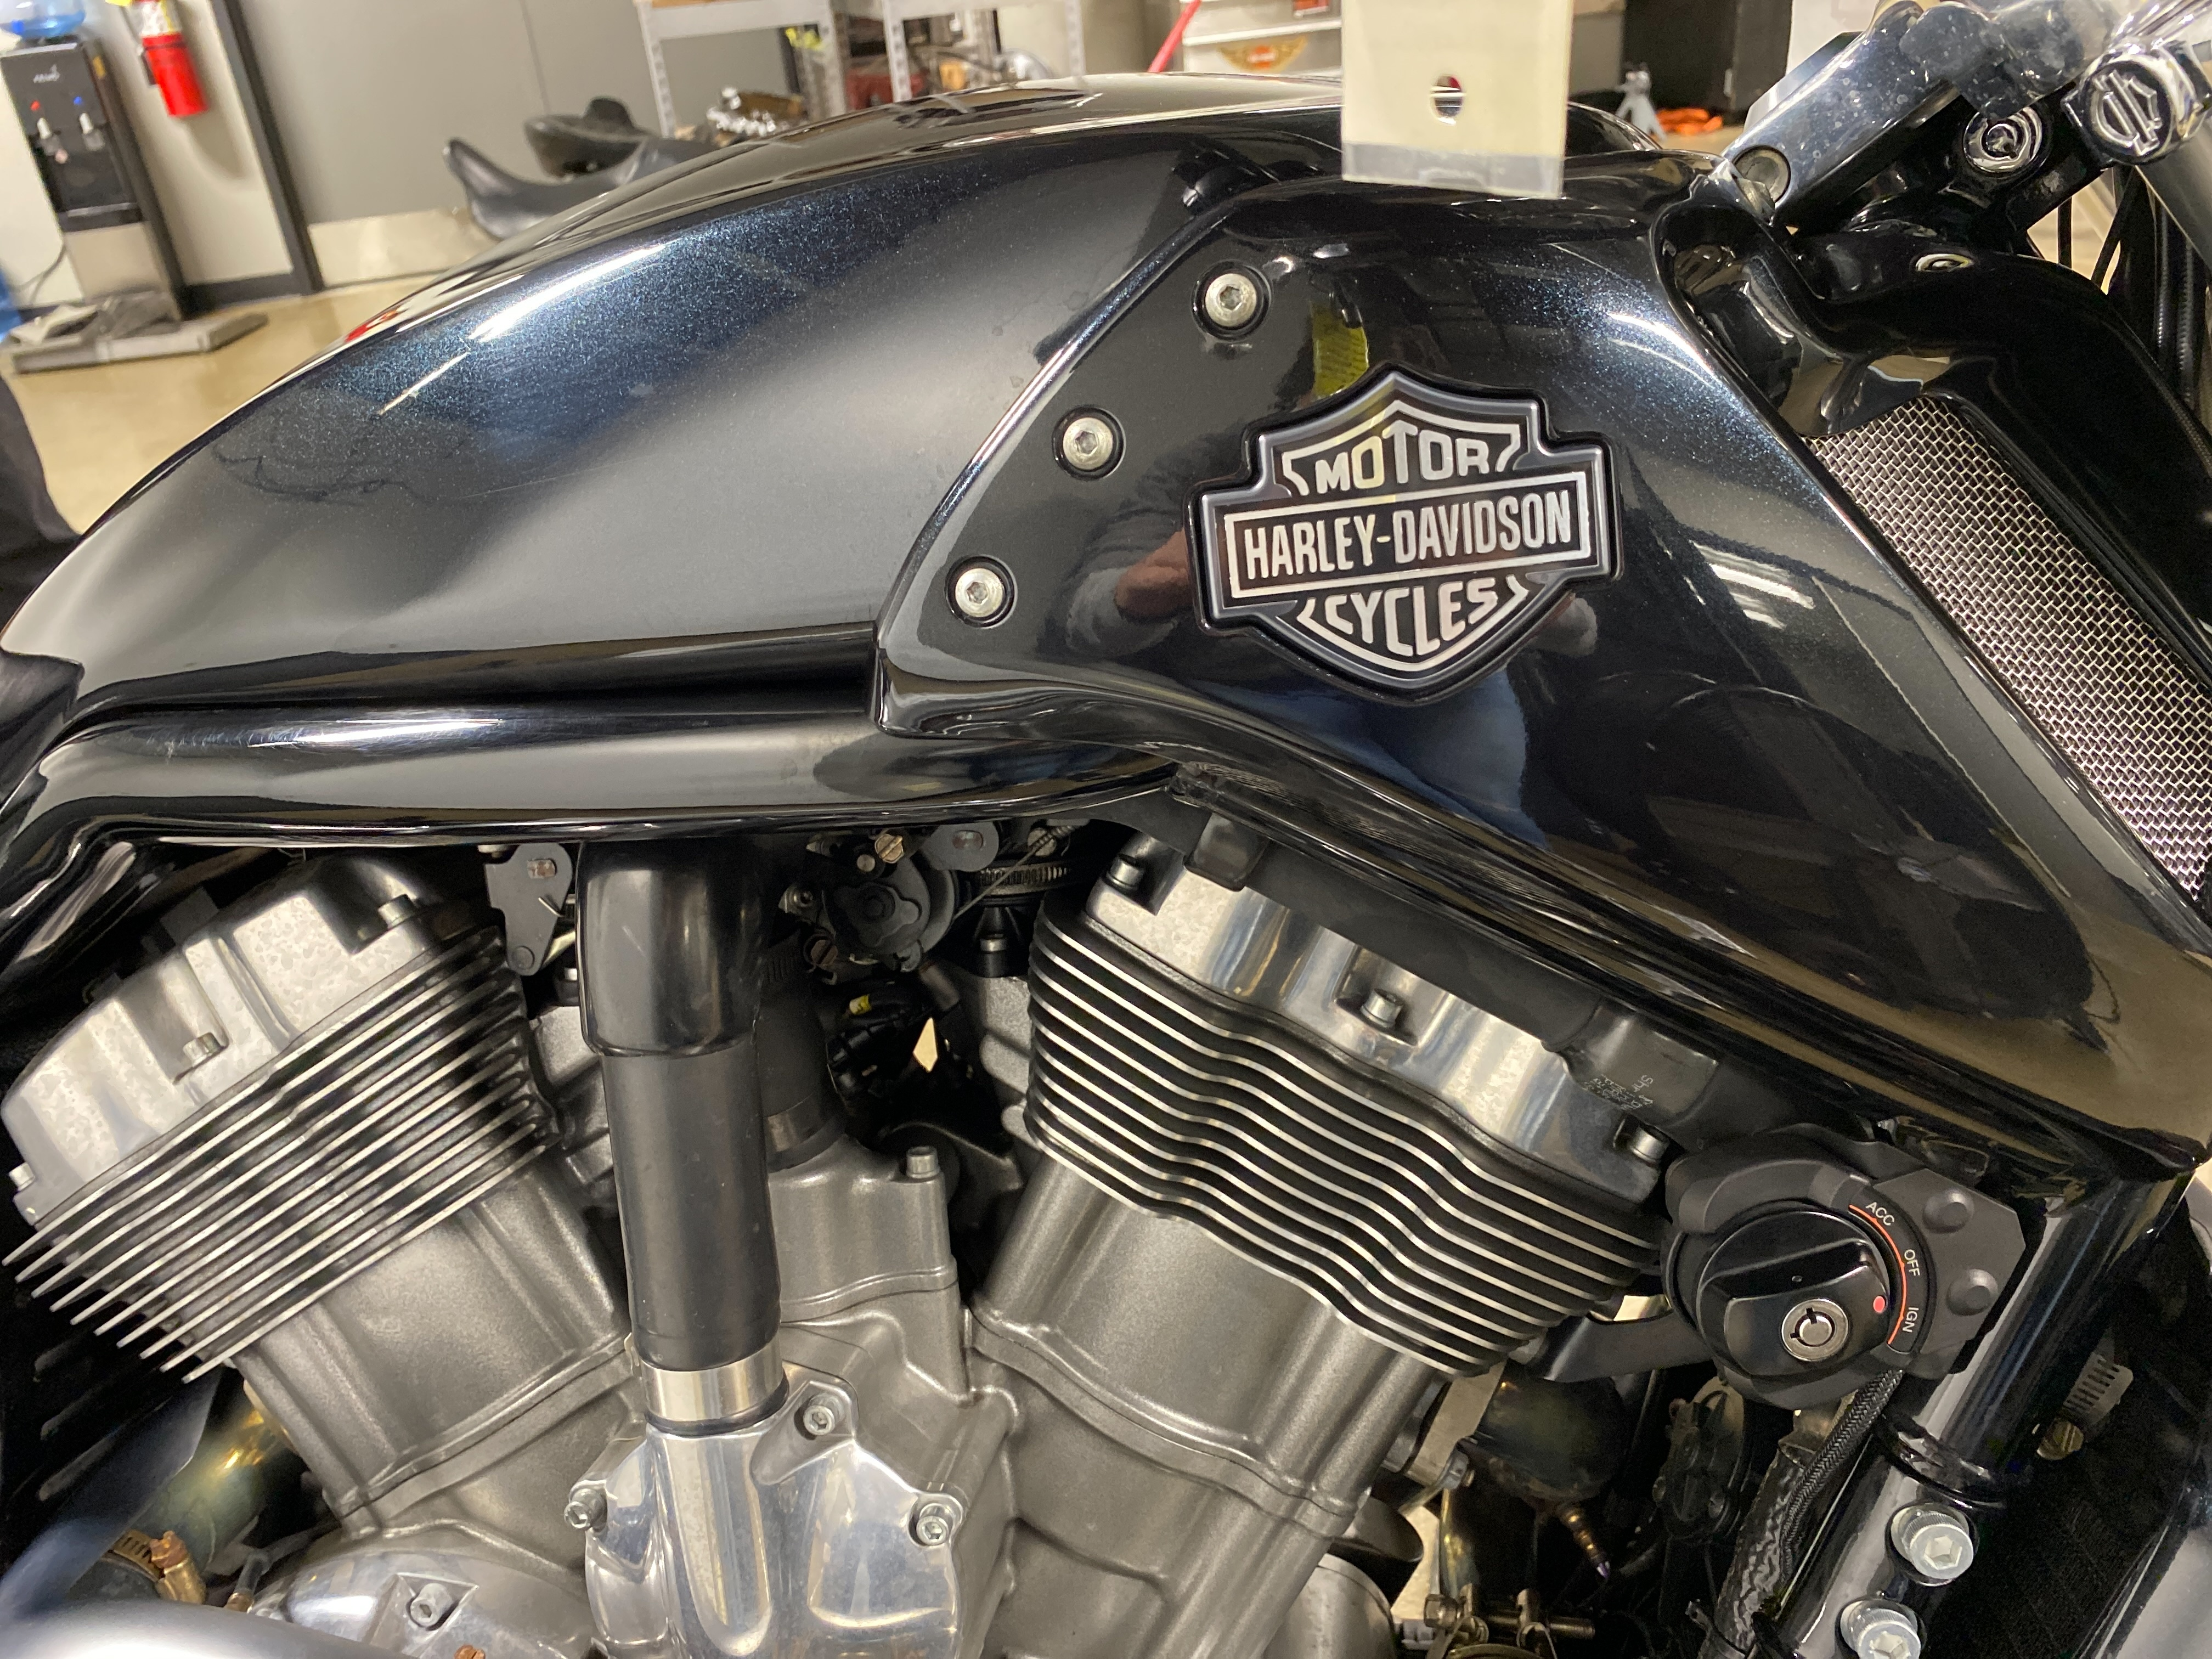 2013 Harley-Davidson V-Rod V-Rod Muscle at Cannonball Harley-Davidson